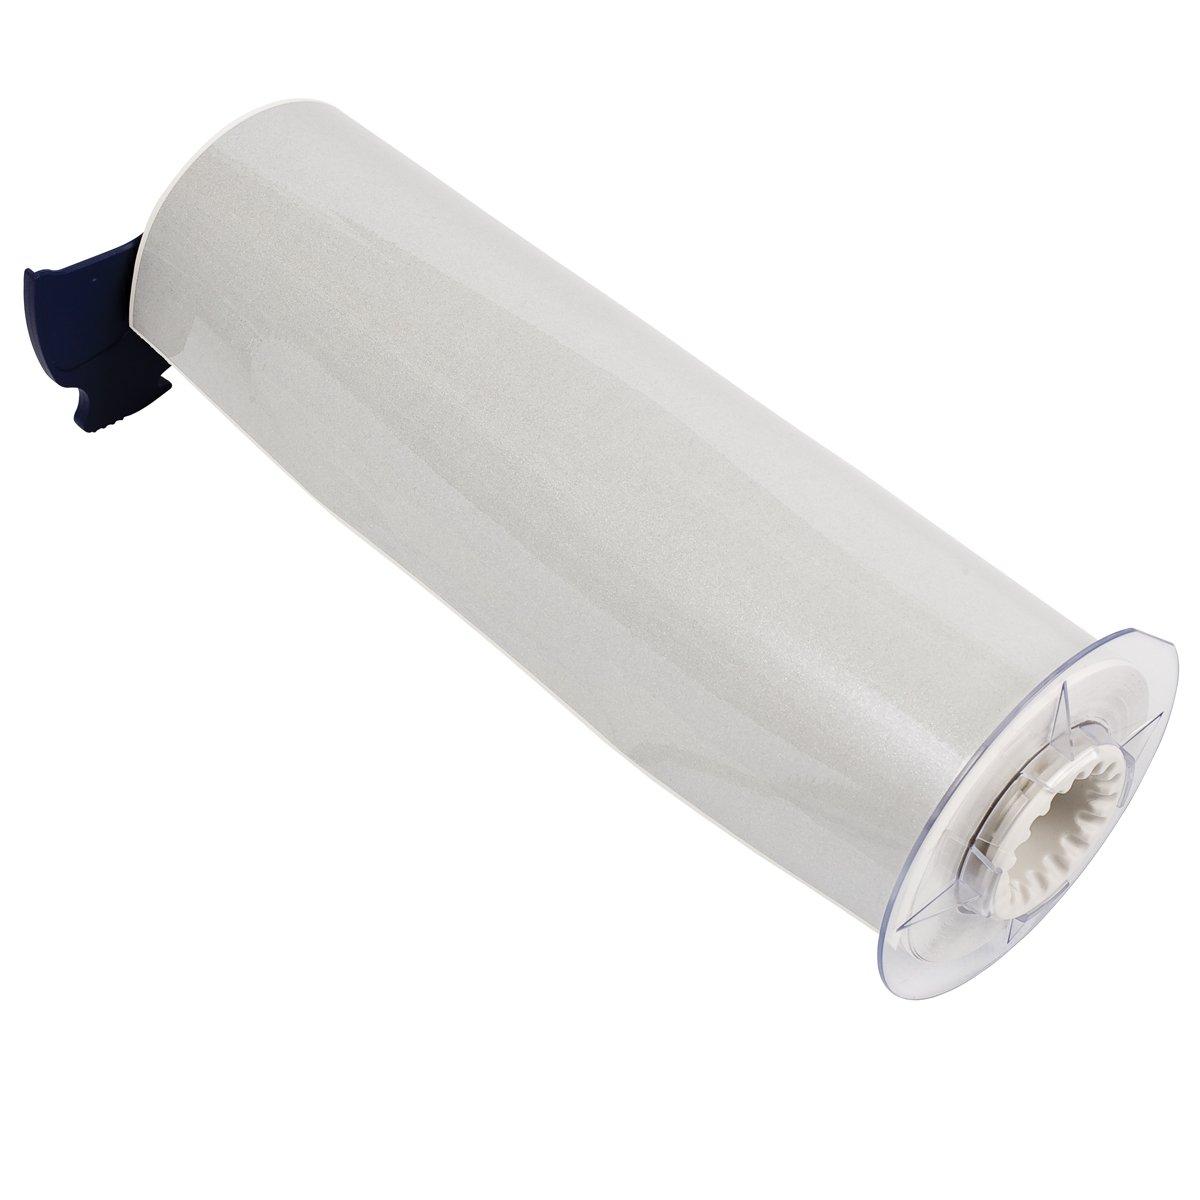 Silver Tape Brady 13590 PowerMark 33 Length x 10 Width B-584 Reflective